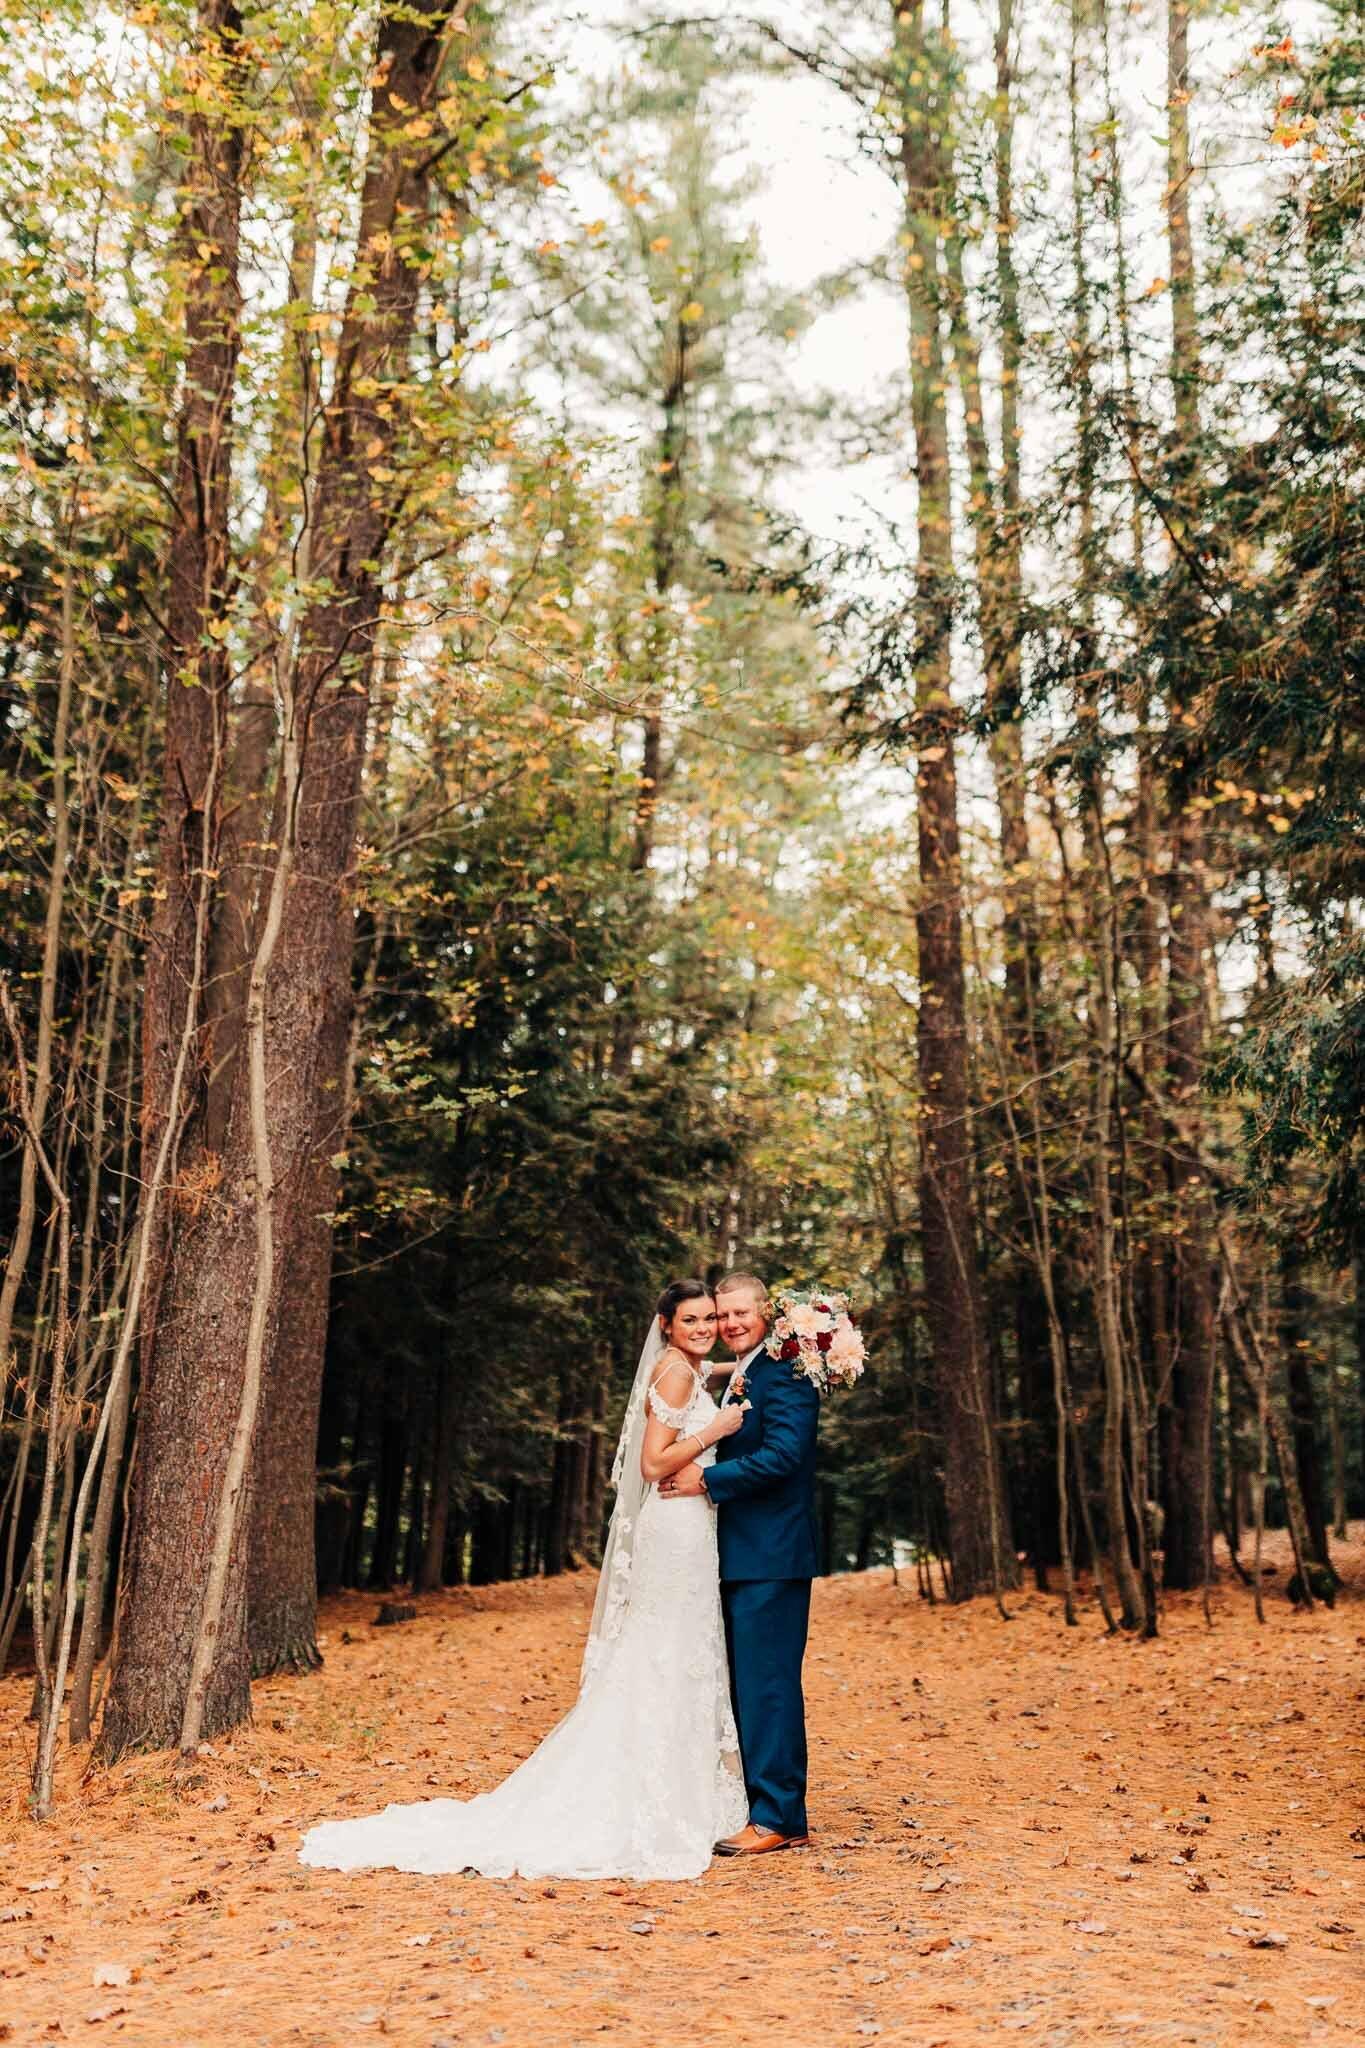 whitewoods-fall-wedding-8378.jpg